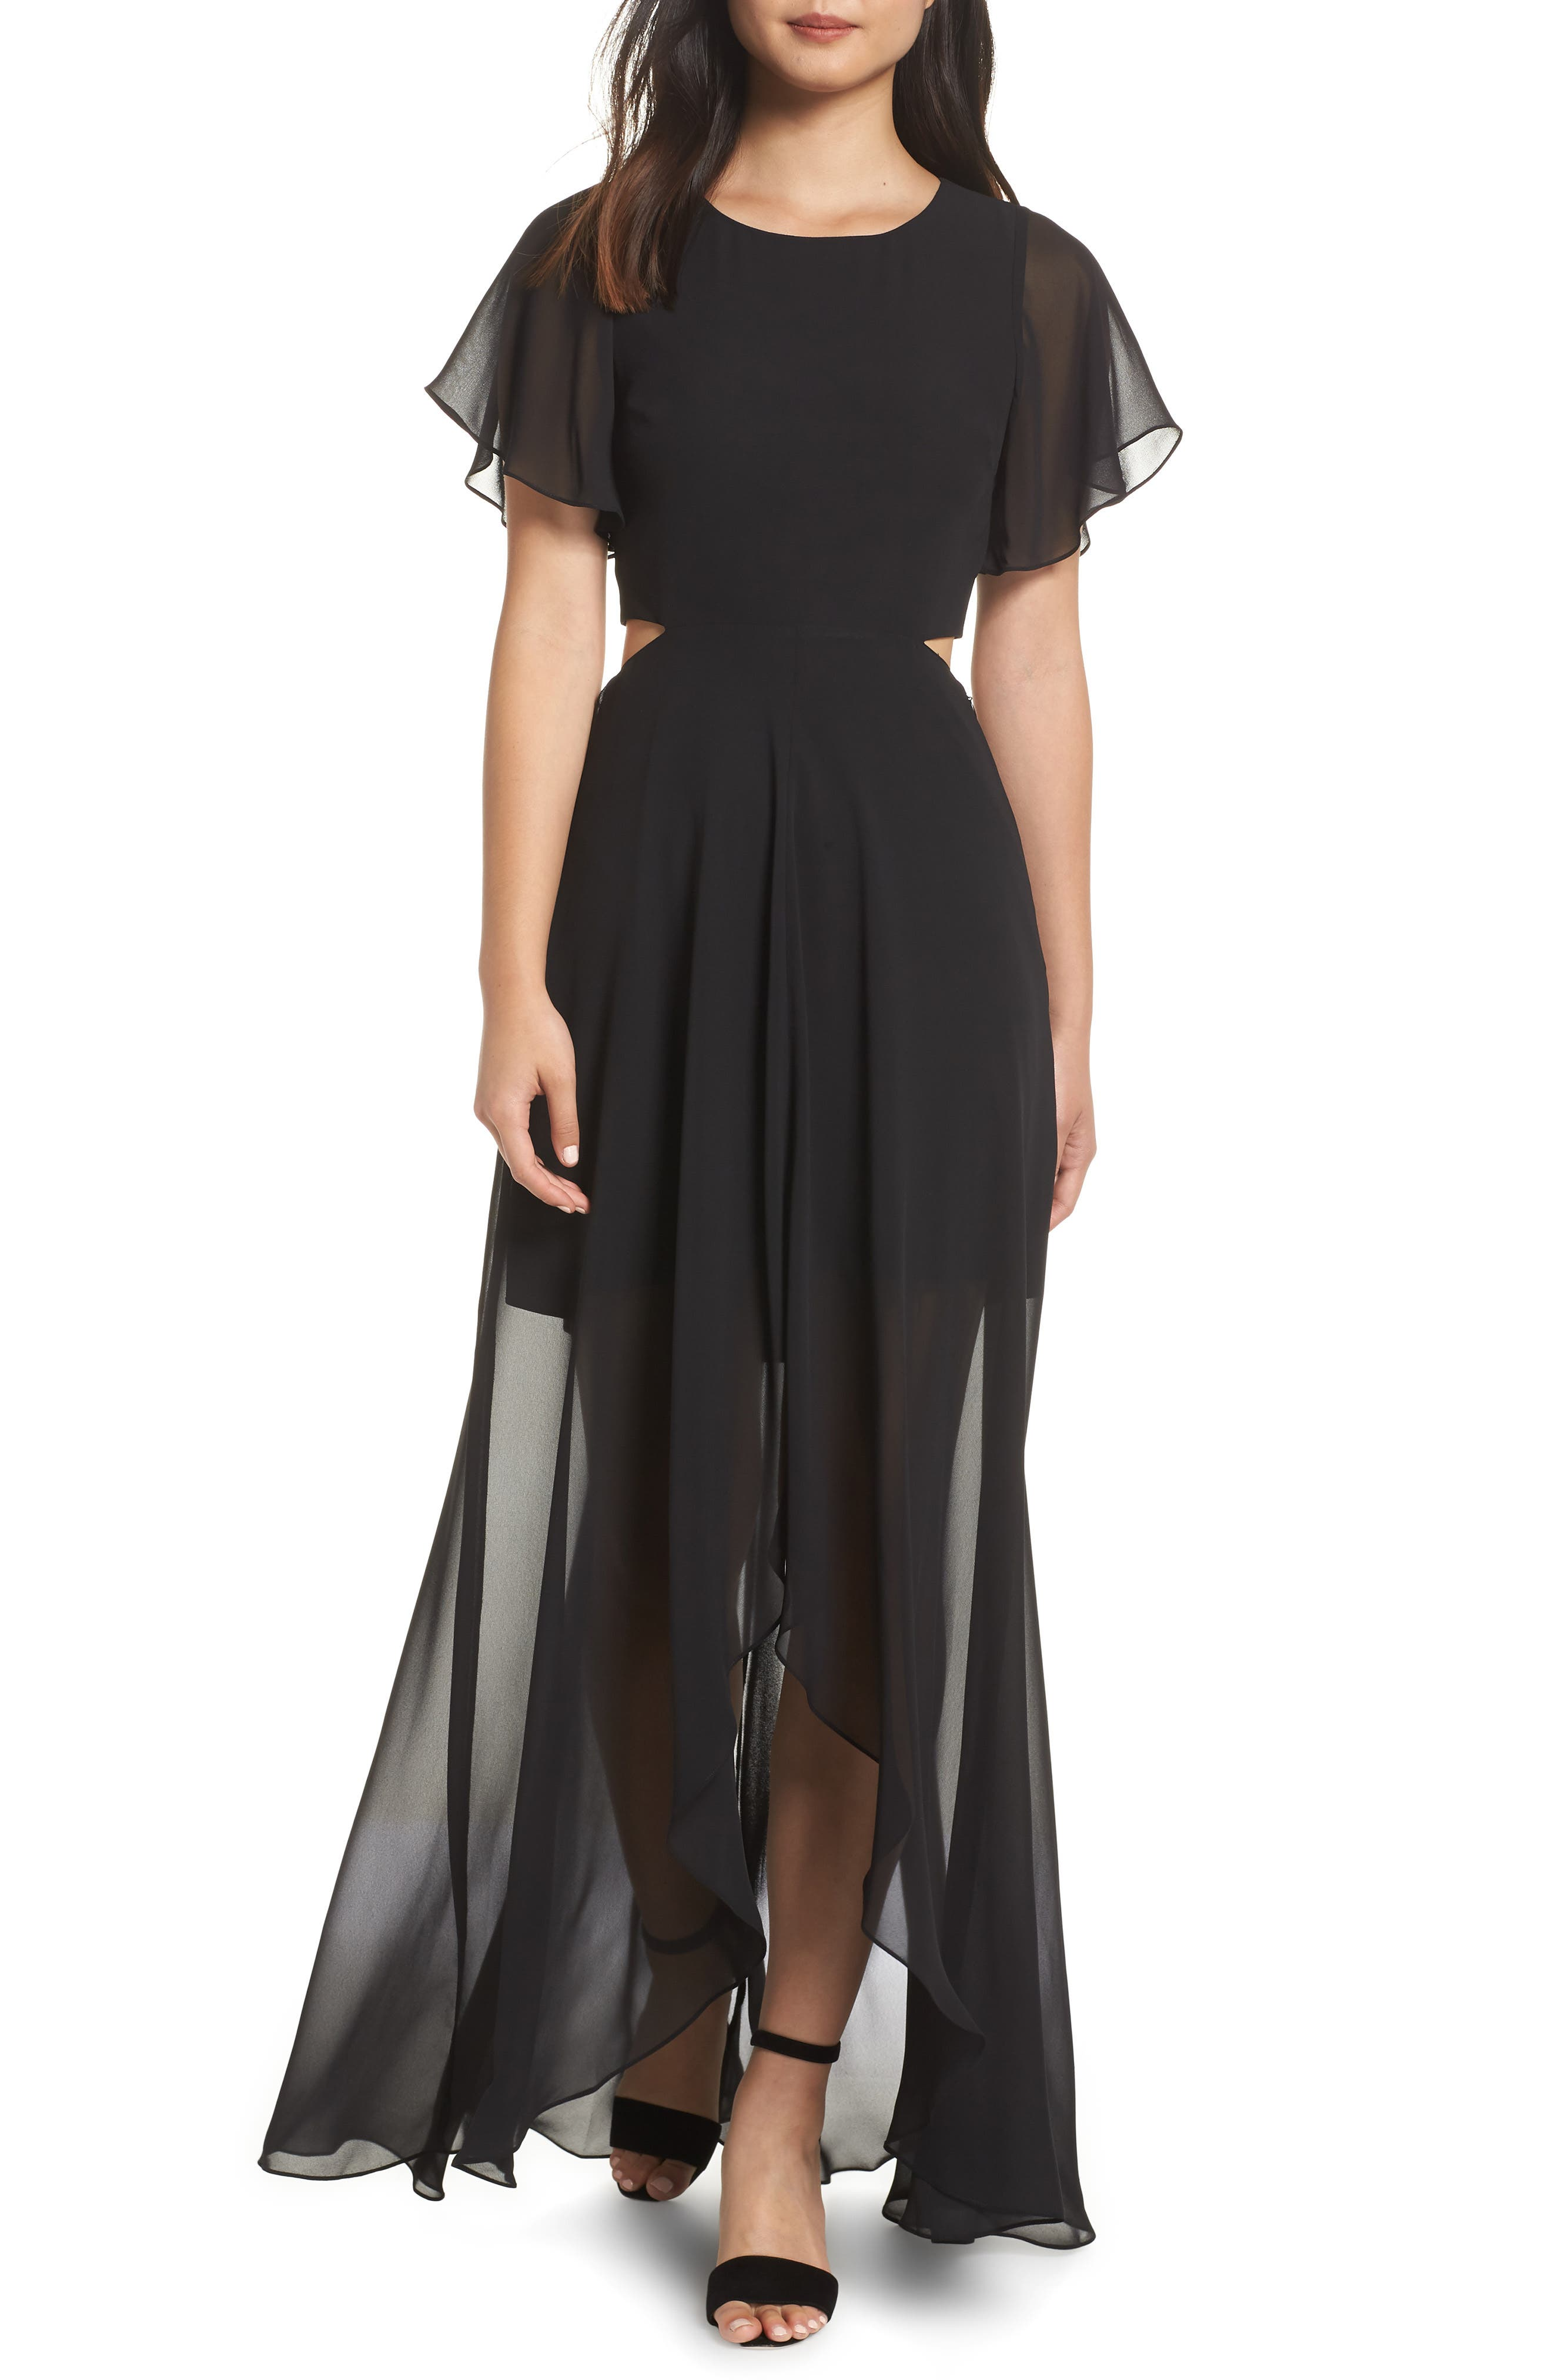 ALI & JAY, Cutout Maxi Dress, Main thumbnail 1, color, BLACK